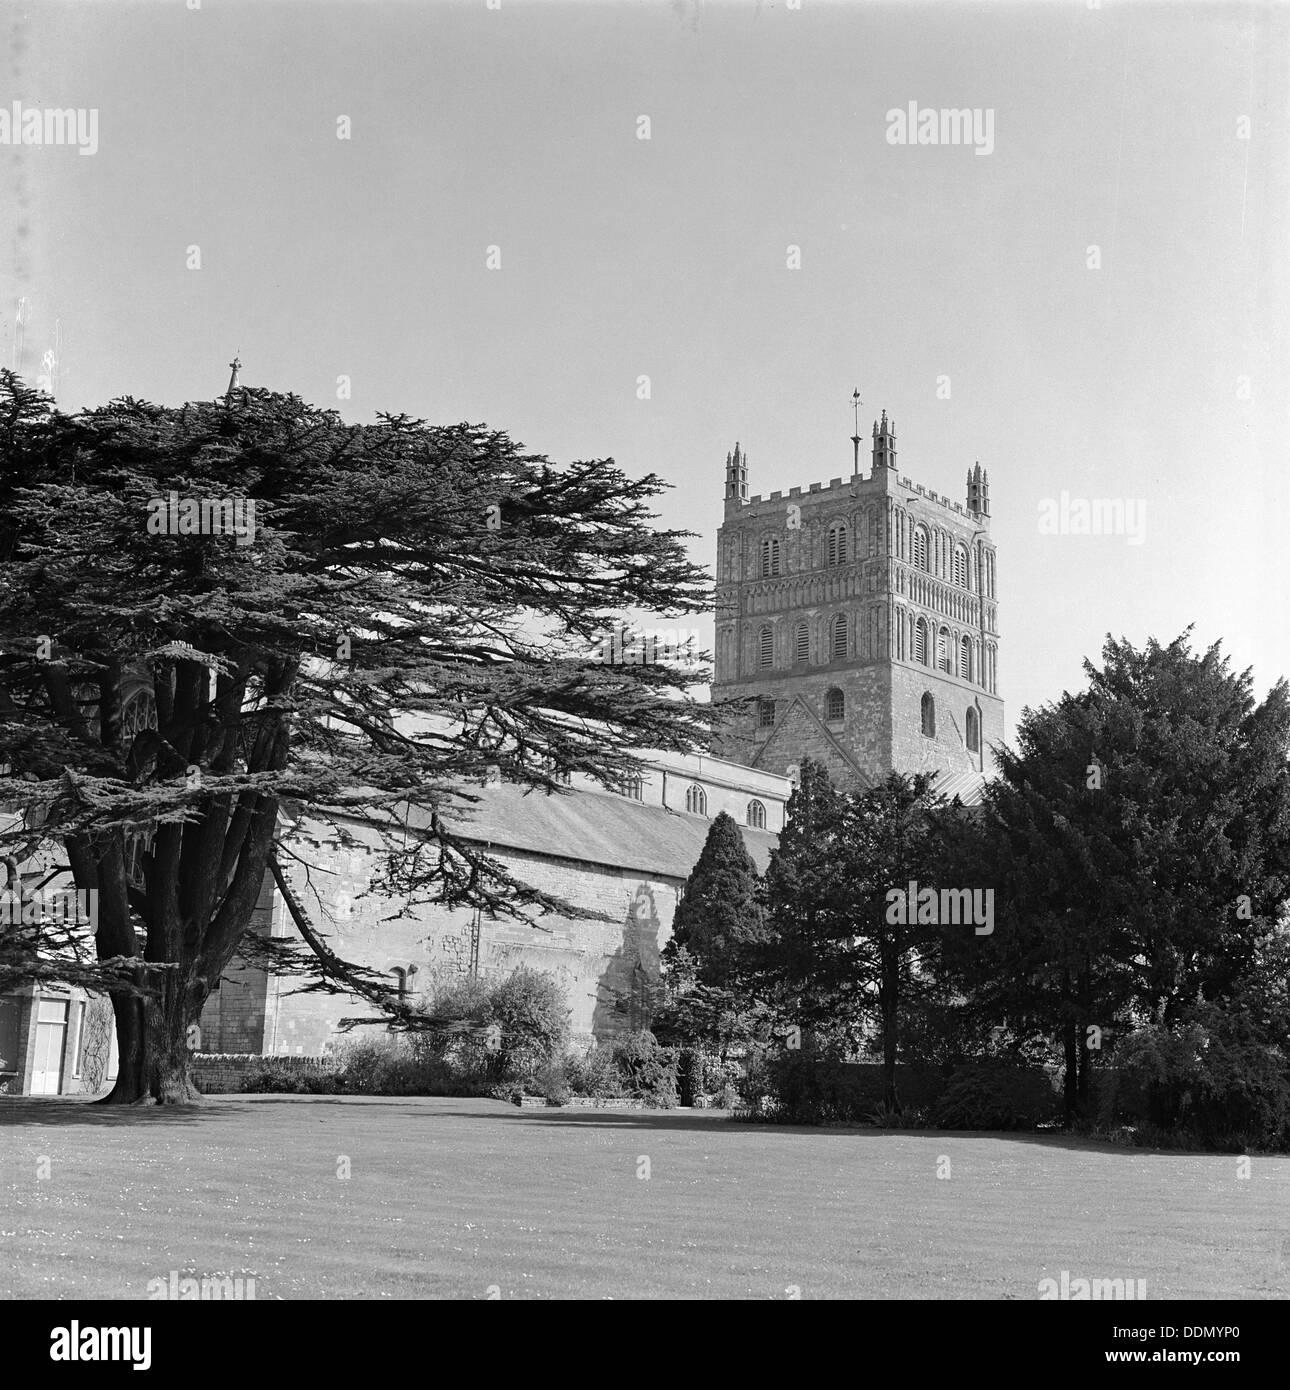 Tewkesbury Abbey, Gloucestershire, 1965. Artist: Laurence Goldman - Stock Image